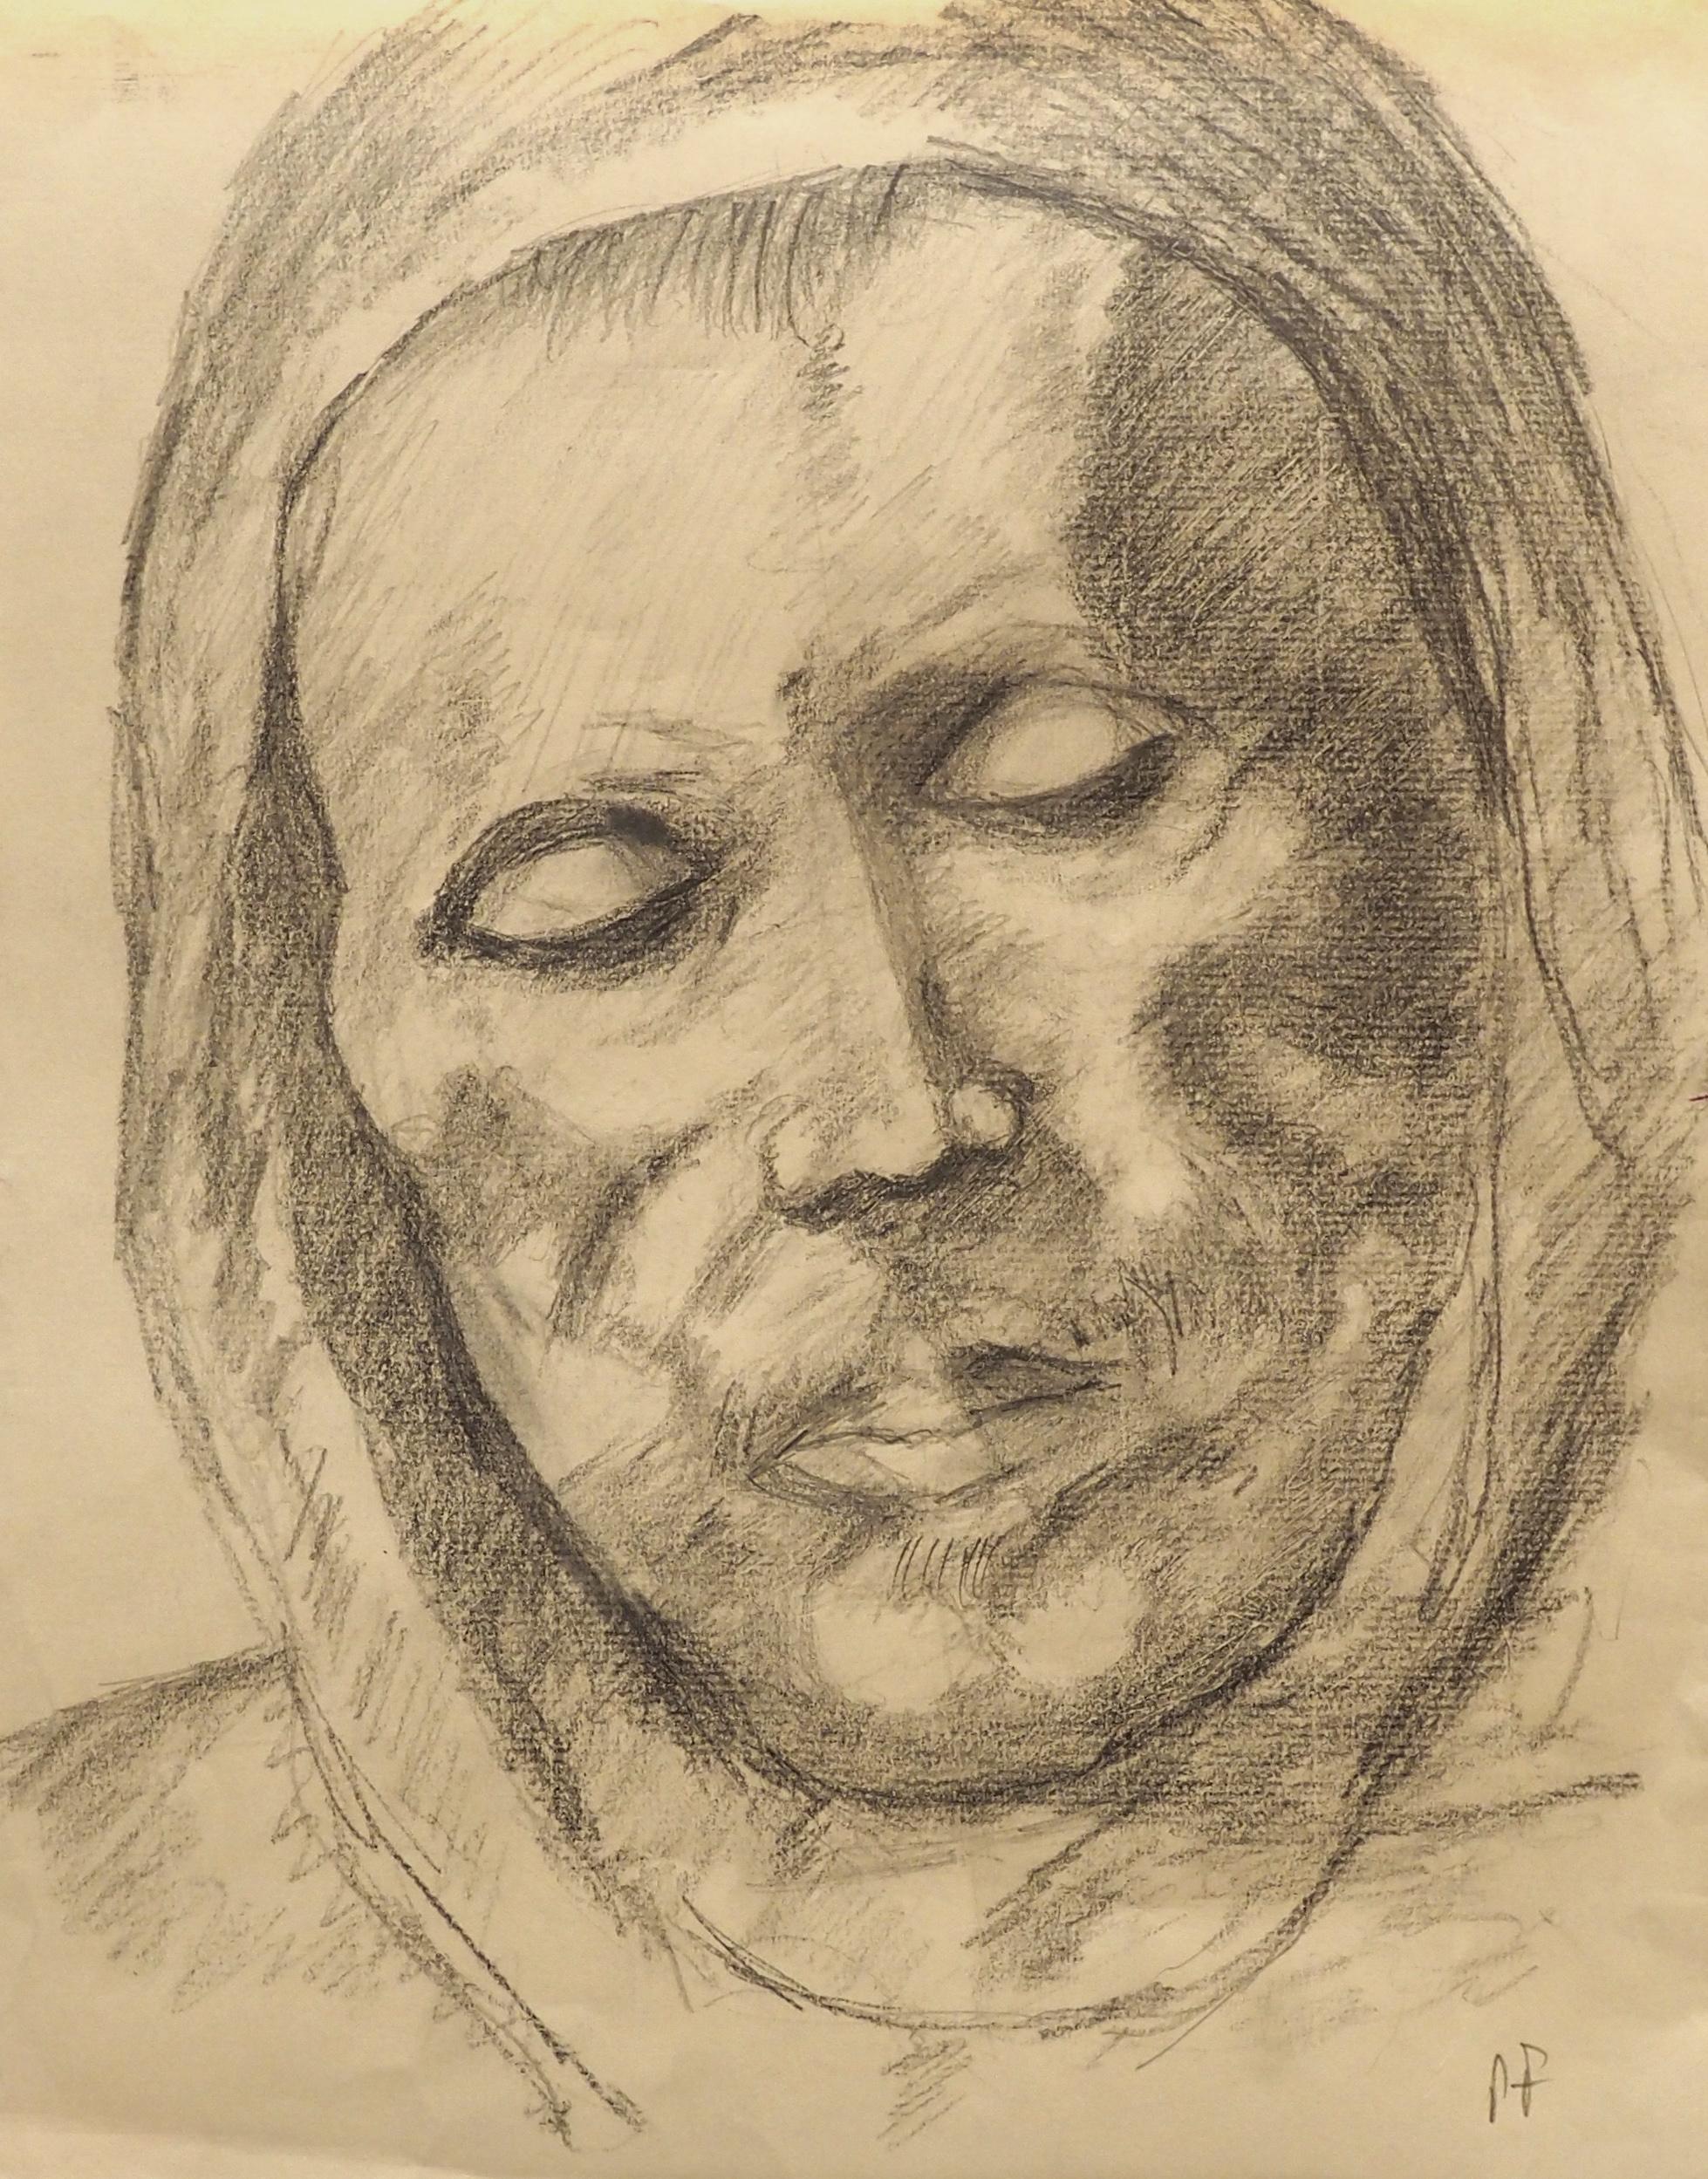 Pierre Favre, crayon, 32x25